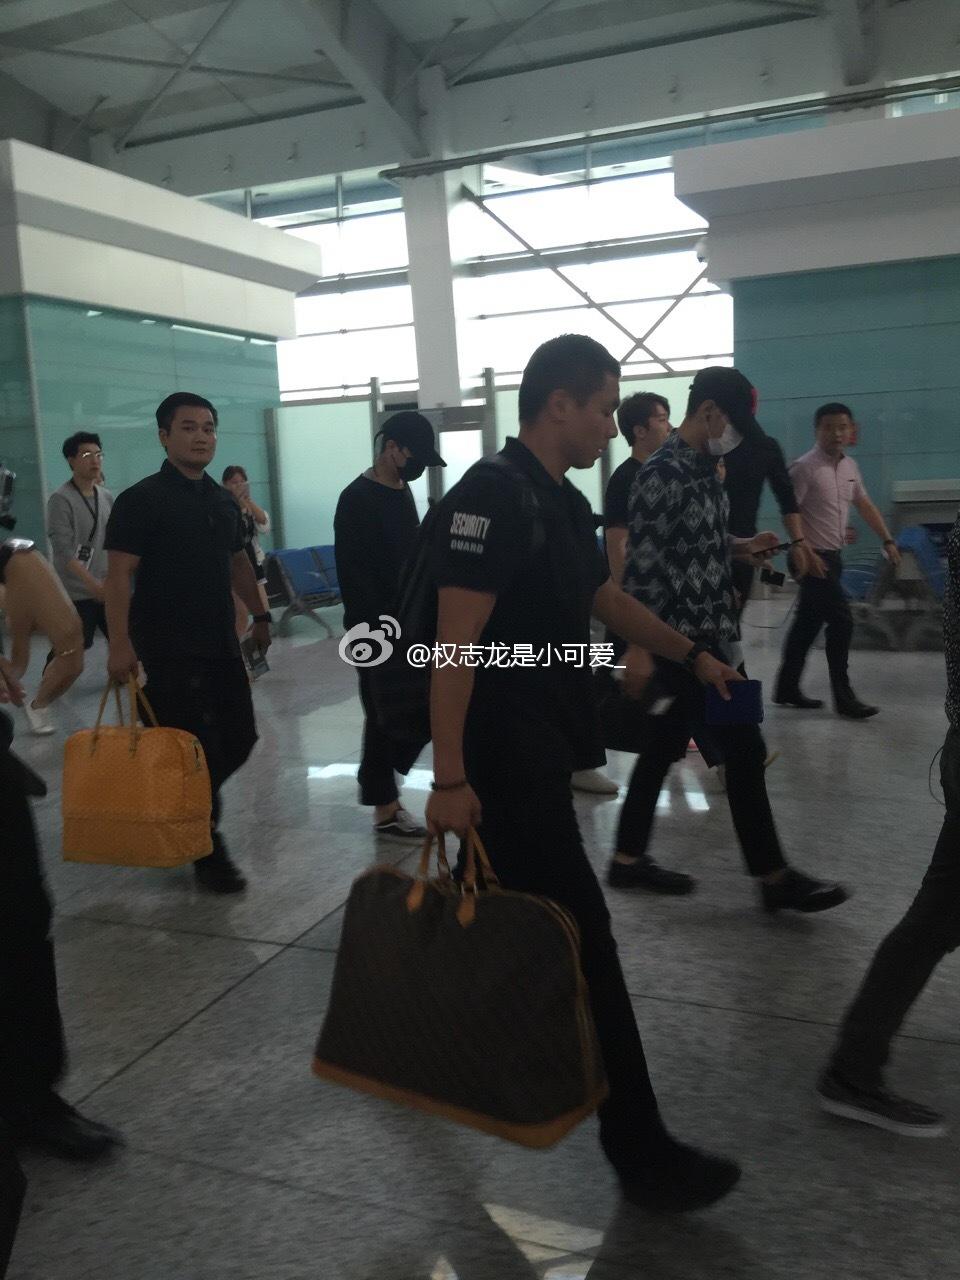 BIGBANG Departure Dalian 2016-06-26 (20)